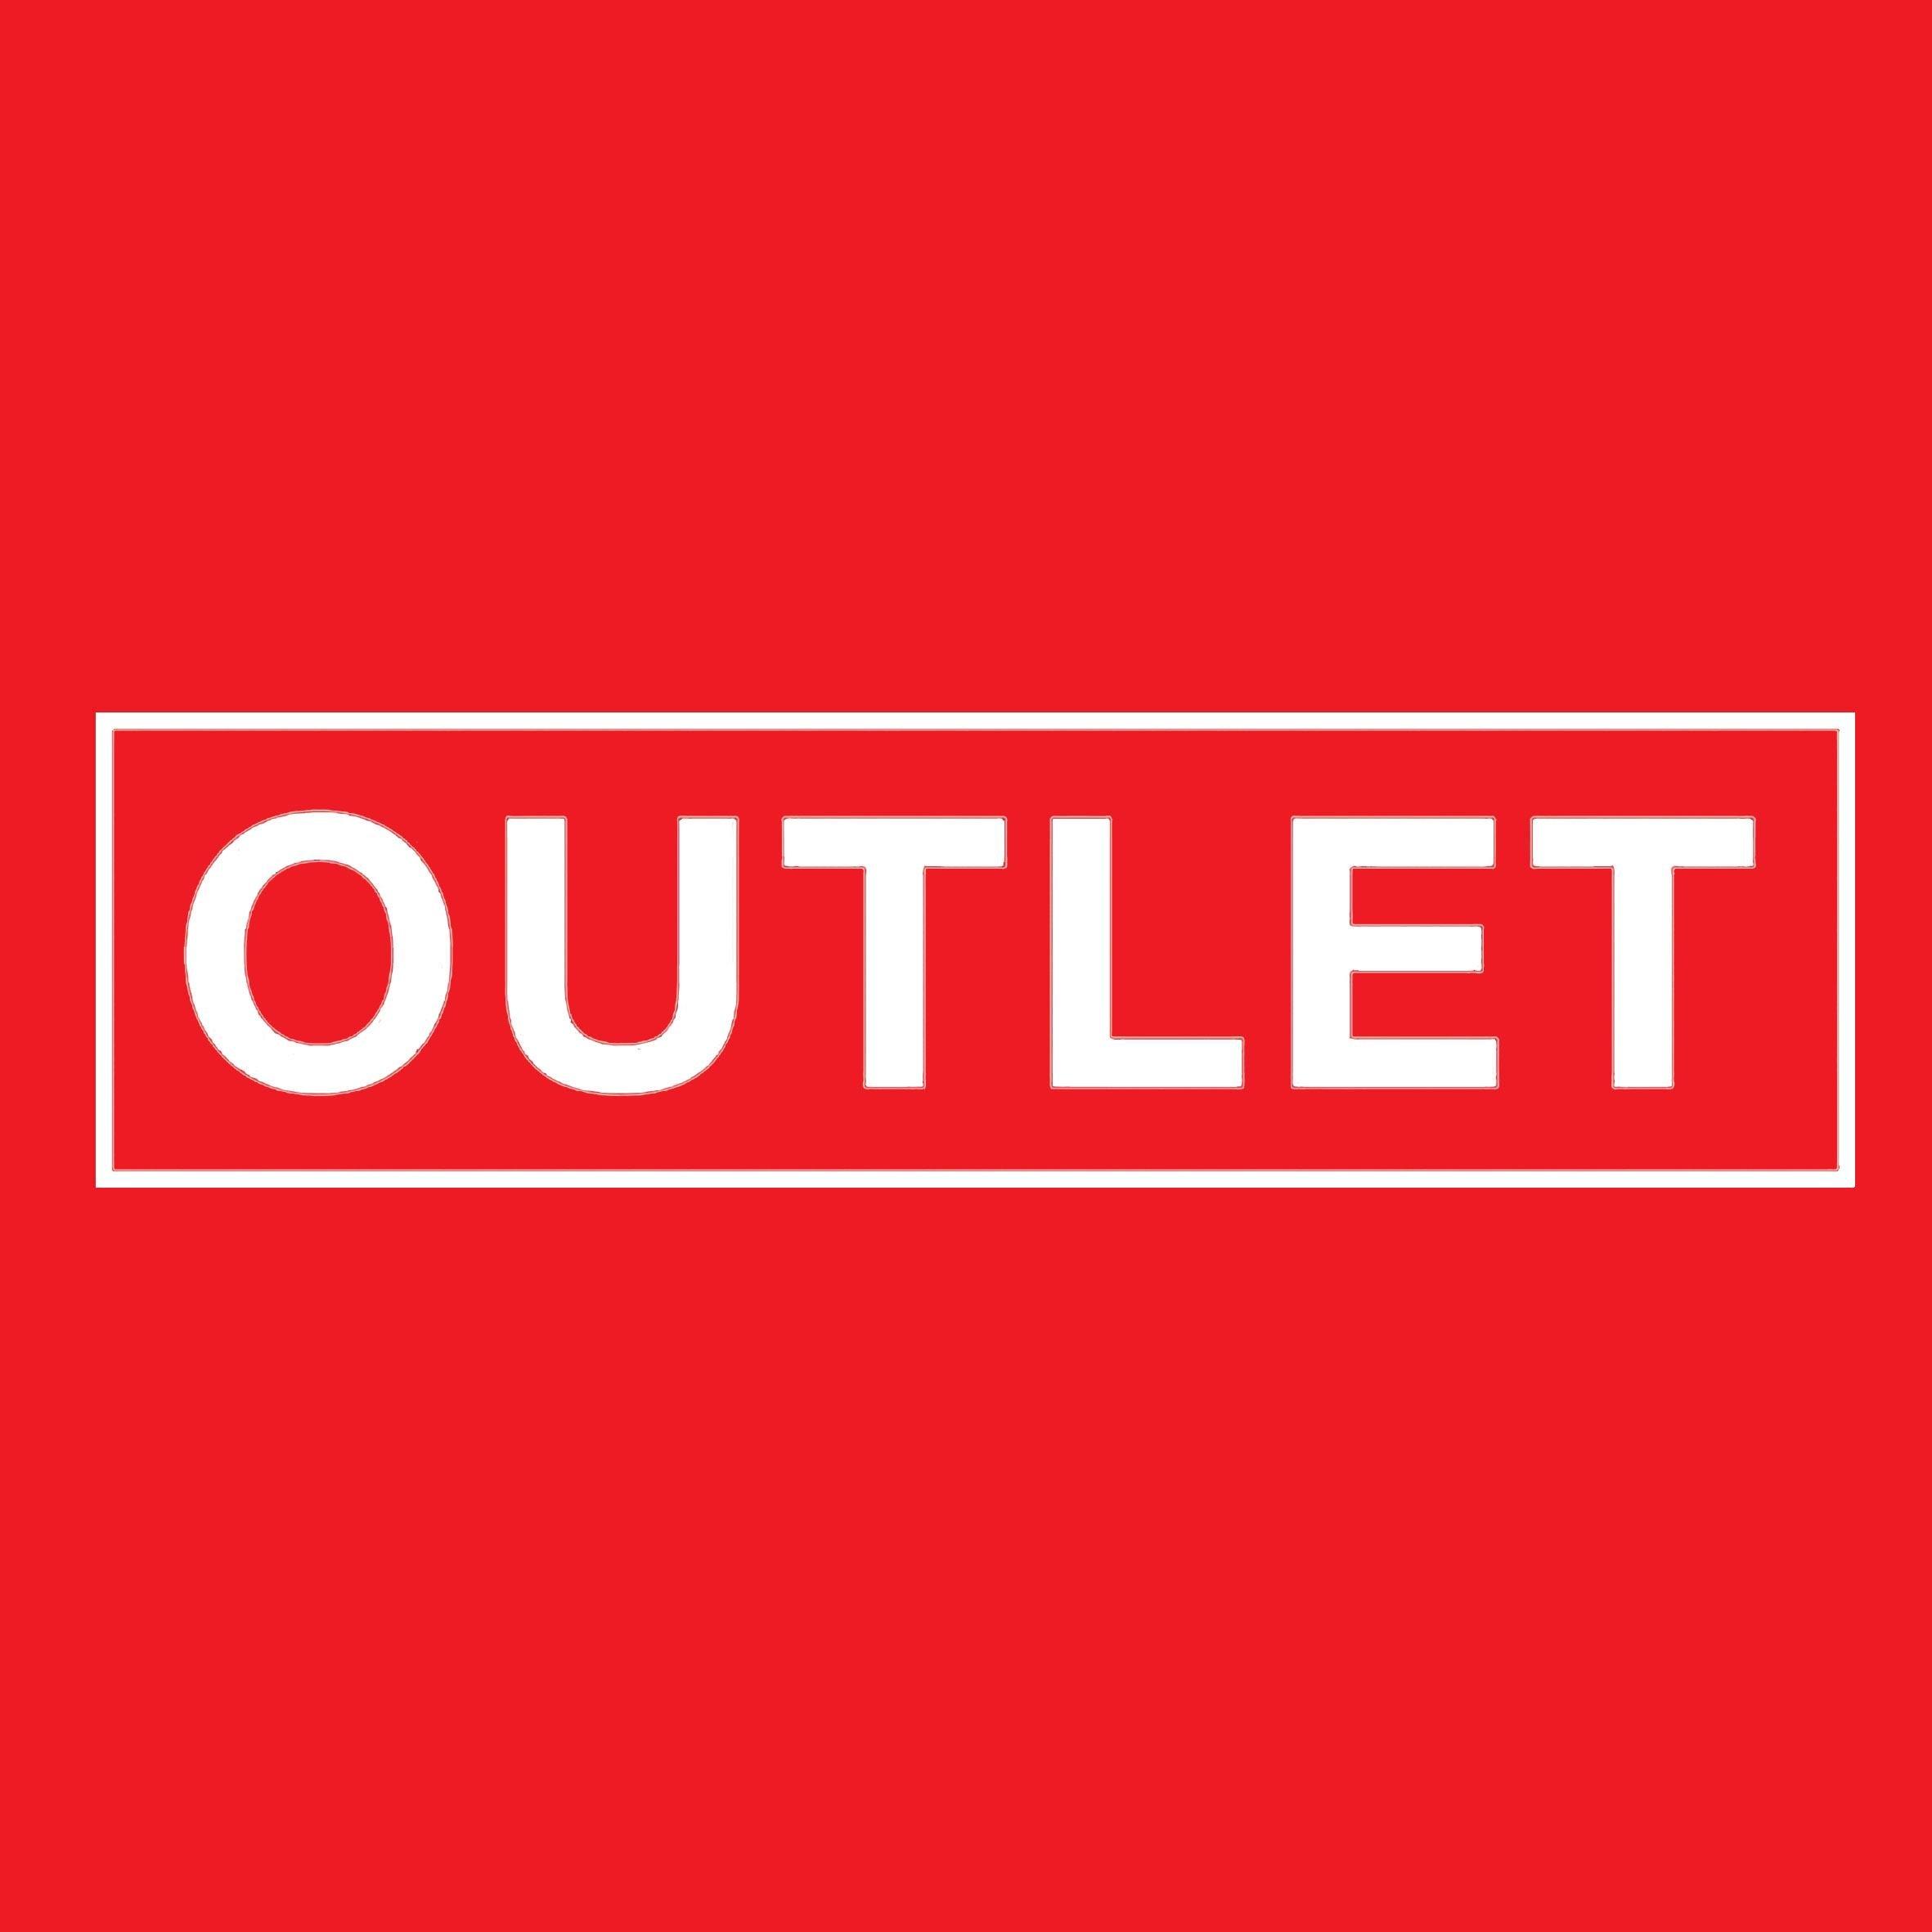 Outlet colchones madrid los mejores precios for Design outlet